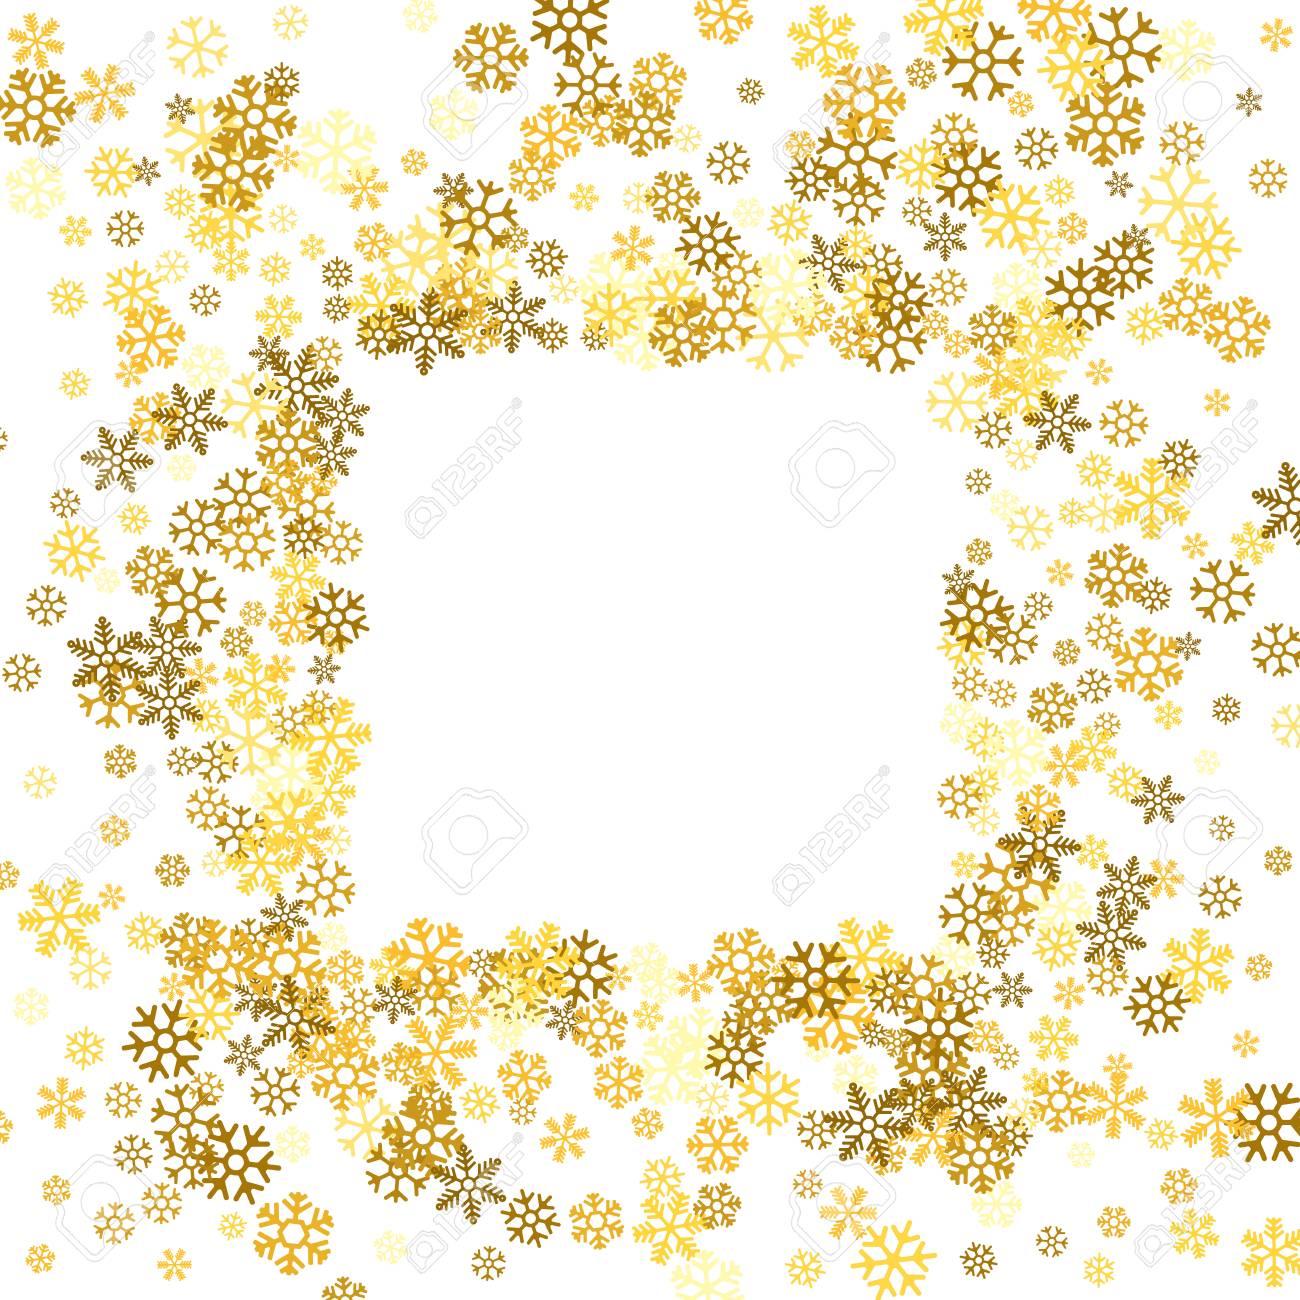 ff3f4701a45 Square gold frame or border of random scatter golden snowflakes on white  background. Design element